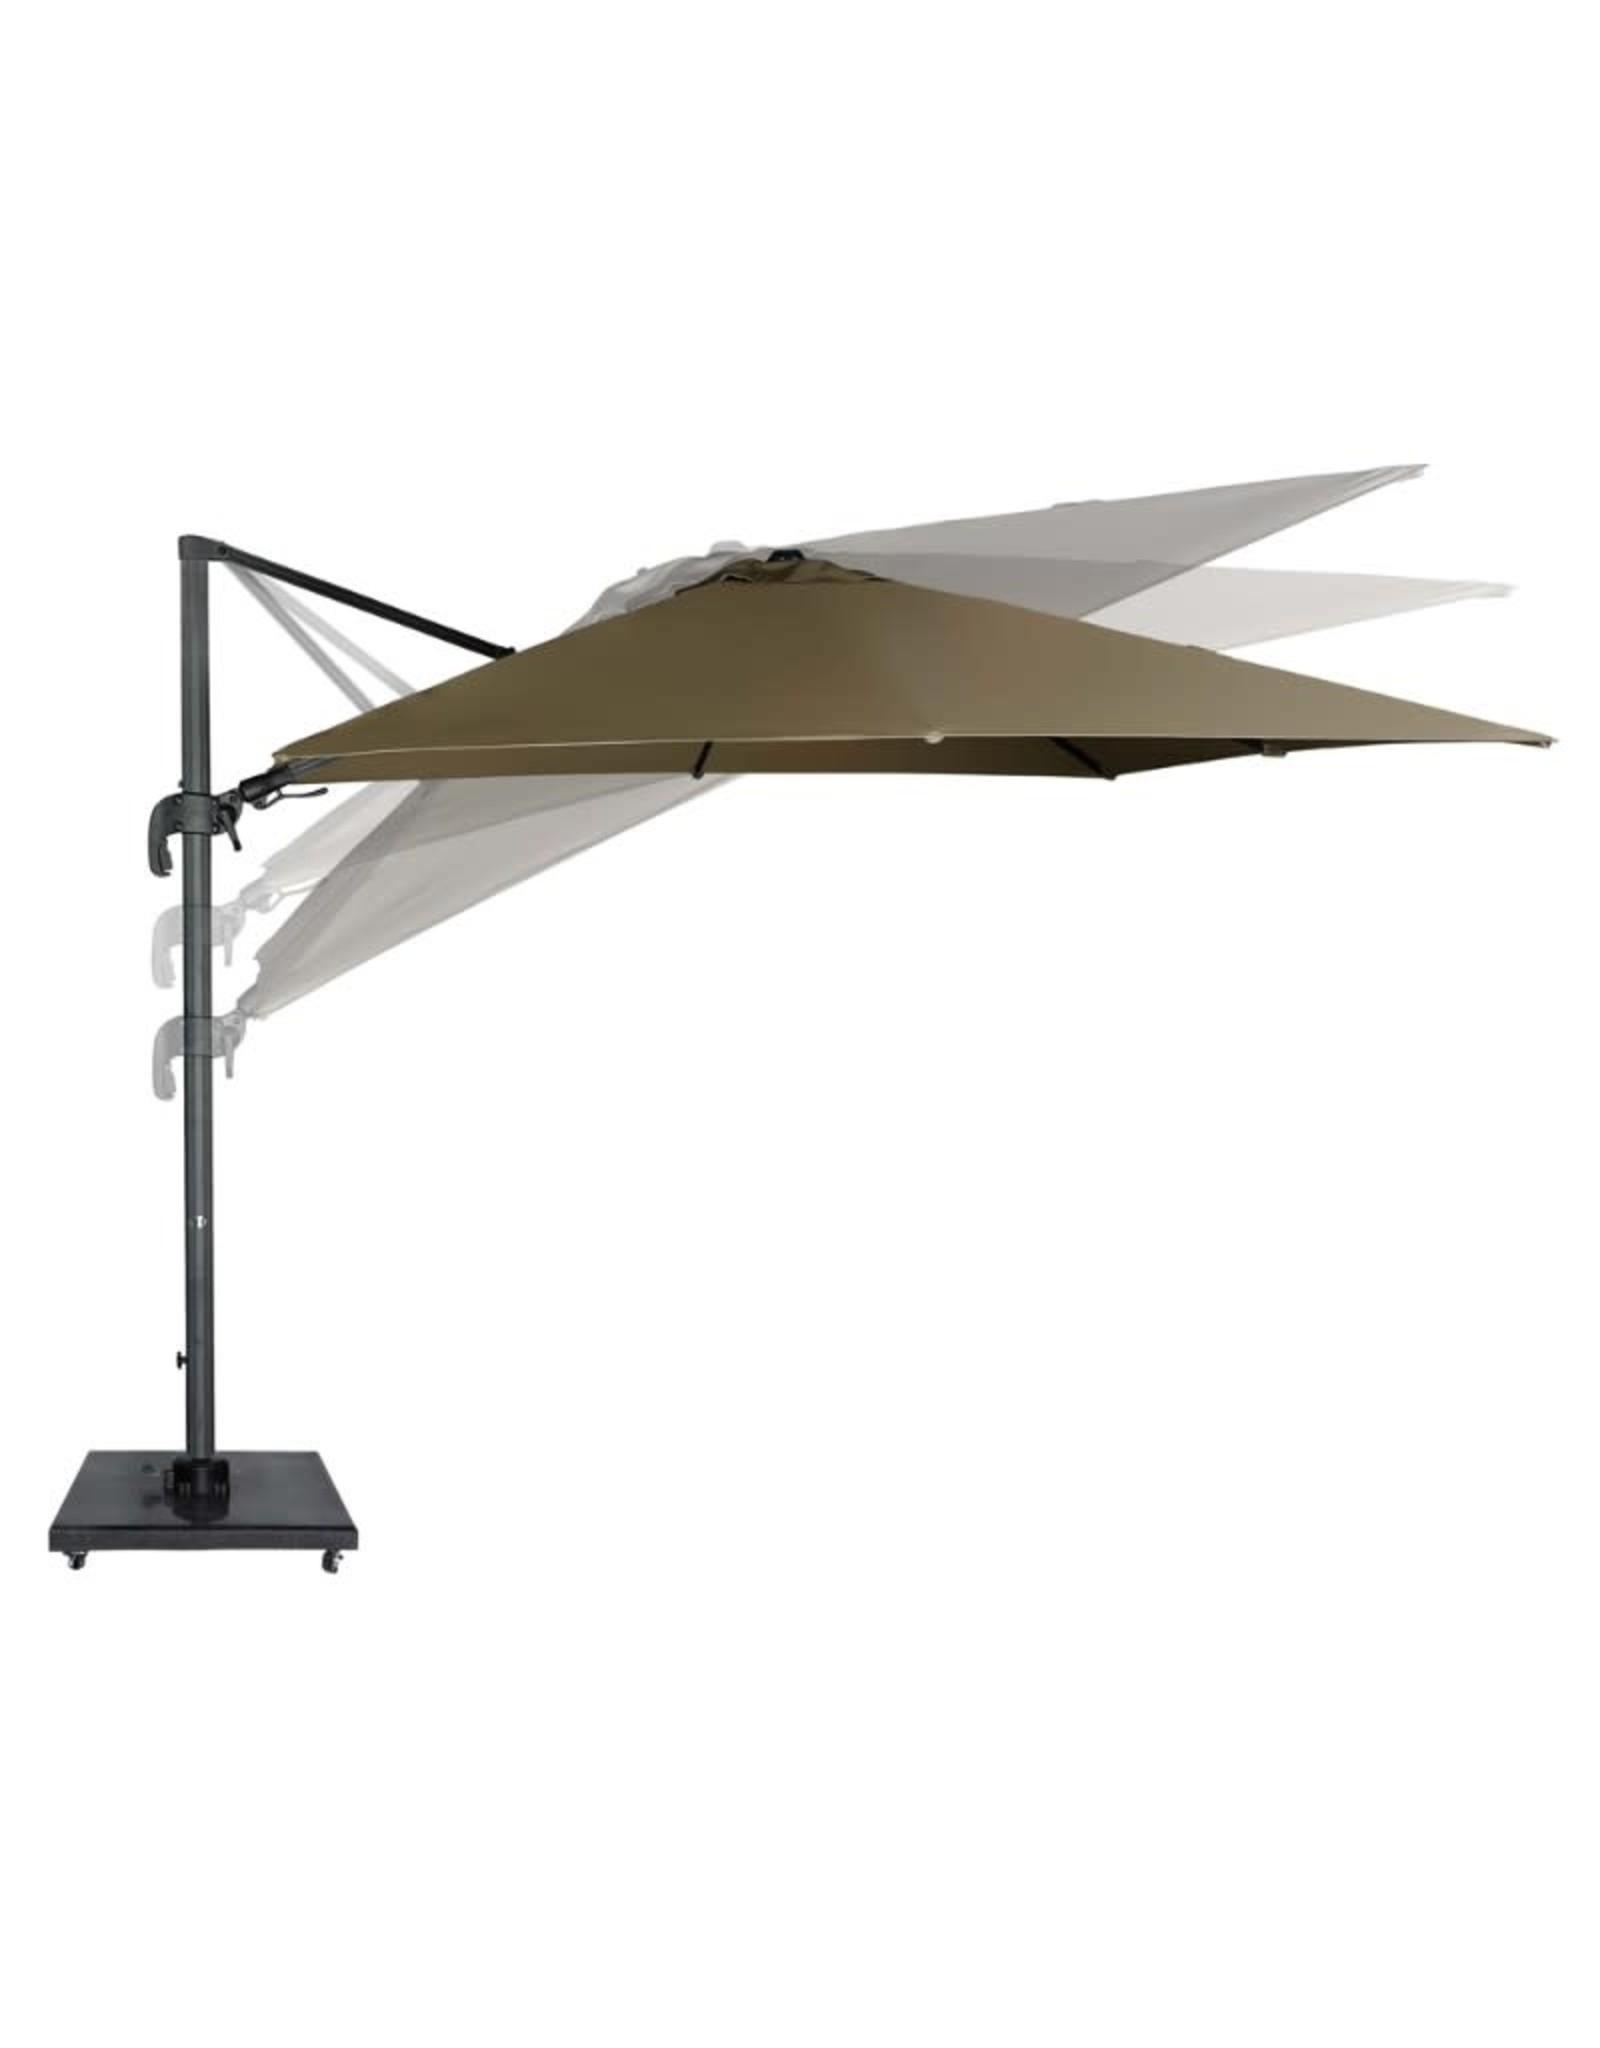 Platinum B.V.  Platinum Free arm parasol Falcon T2 2.7x2.7 taupe